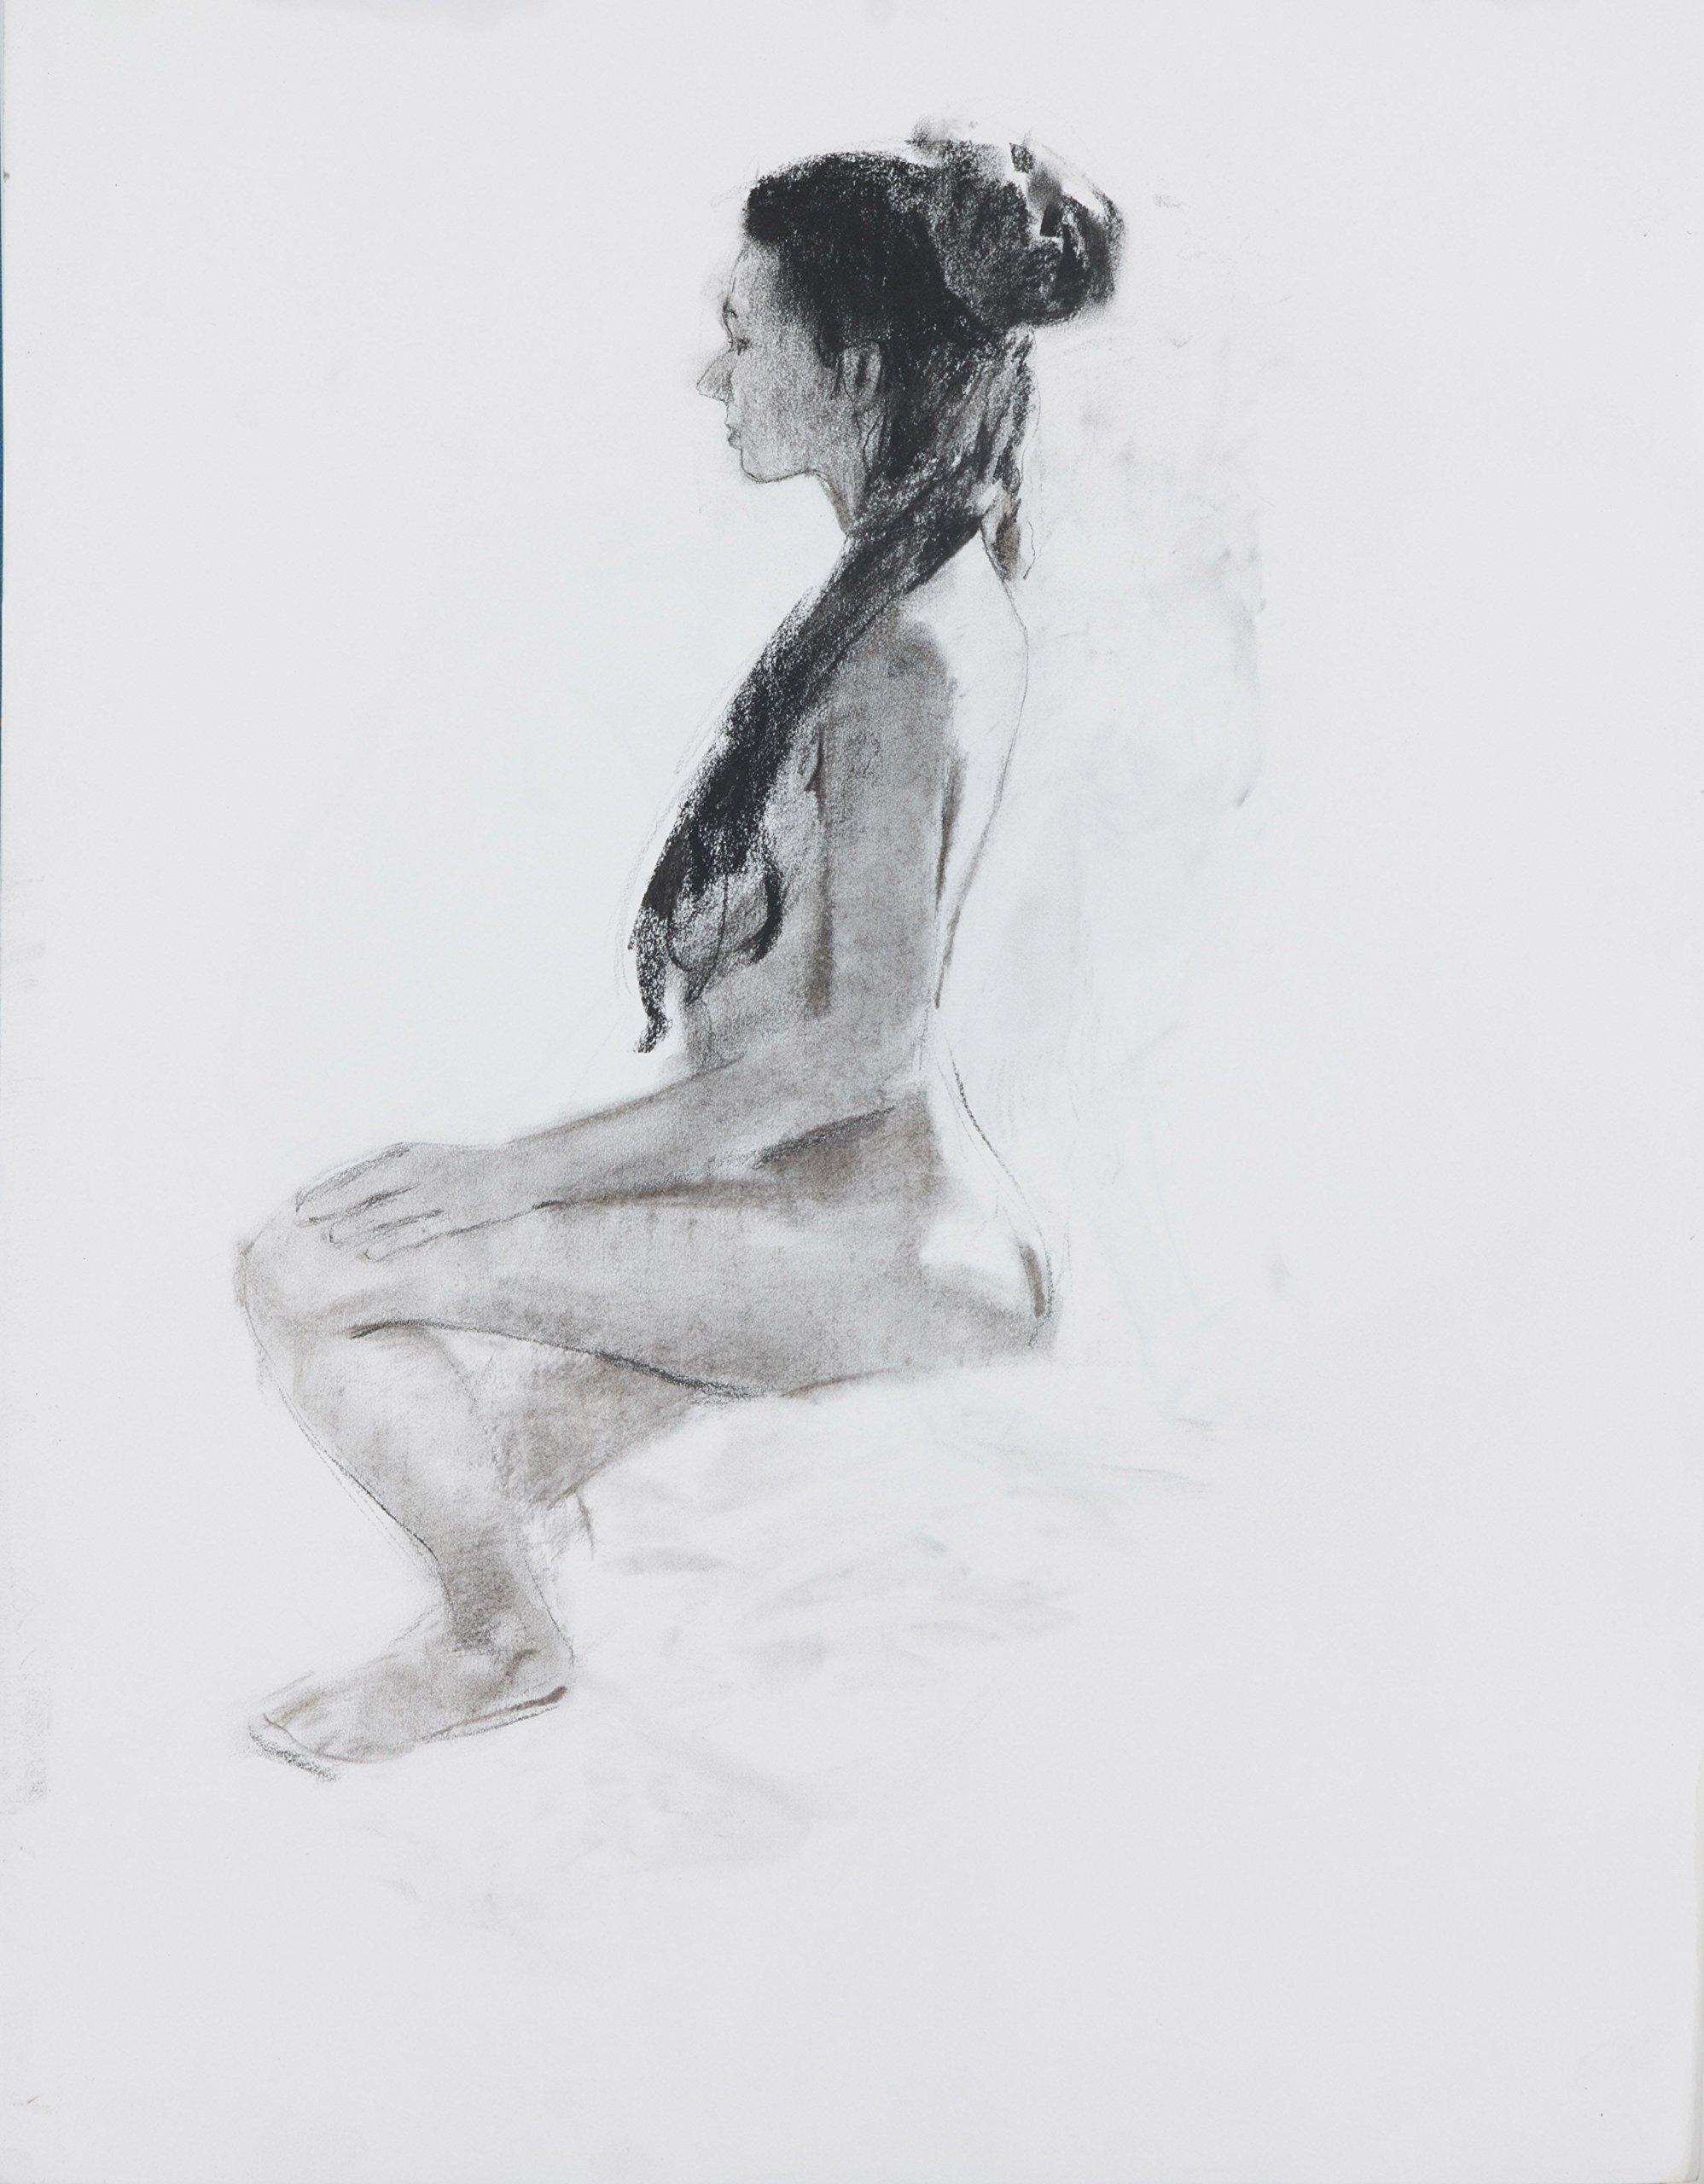 2017110801 White Girl With Dreadlocks